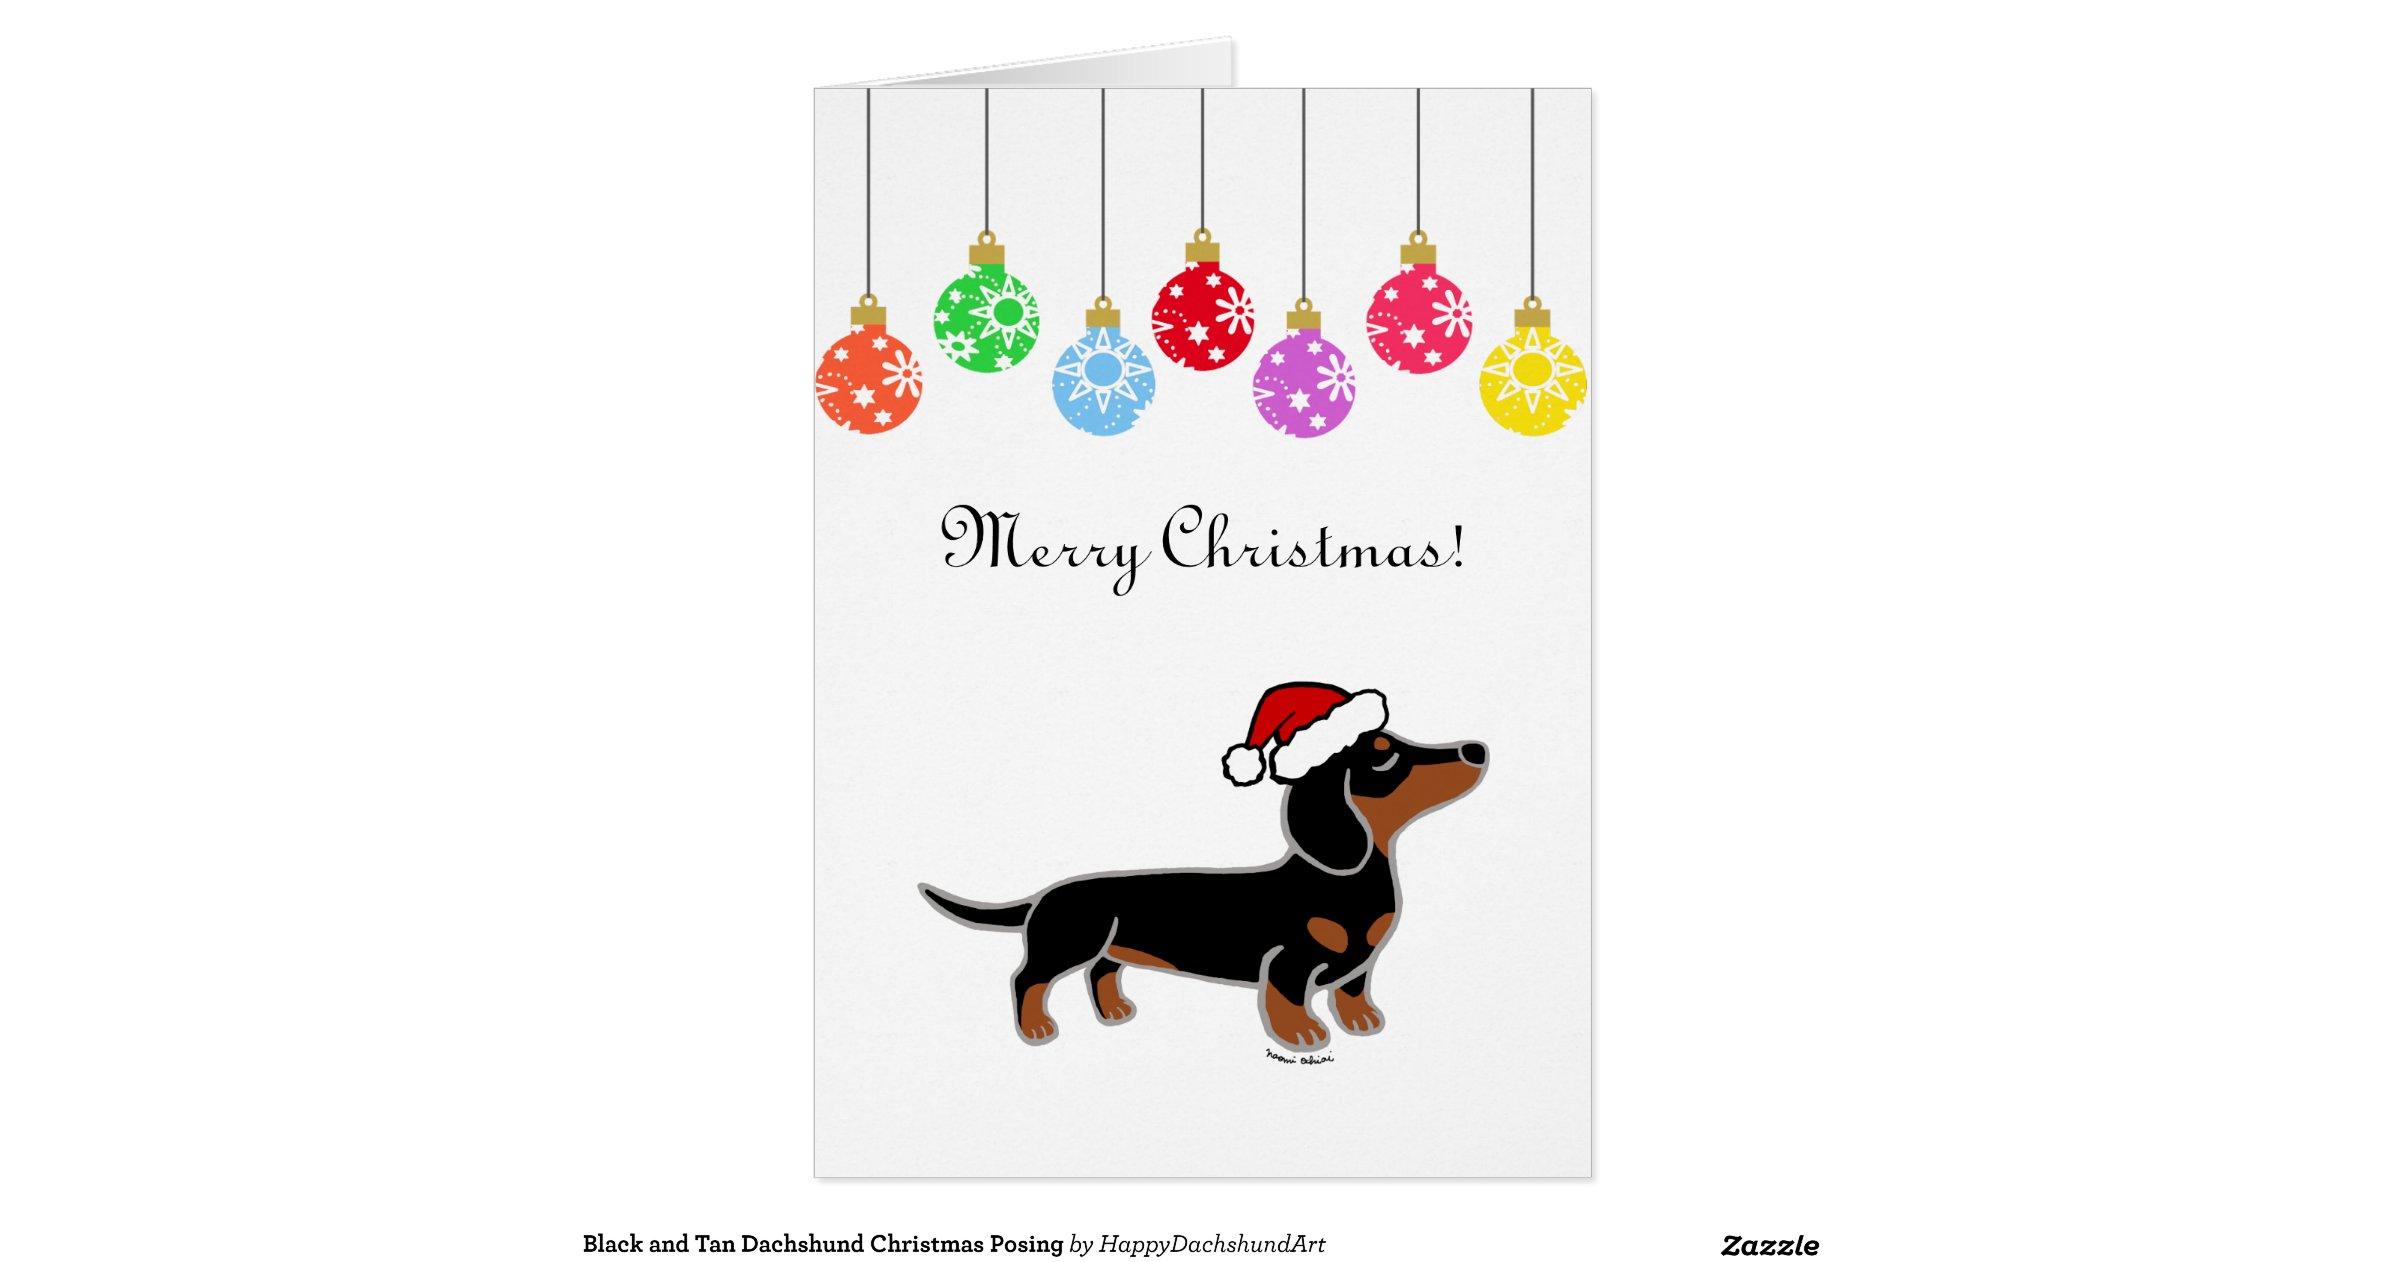 Snap Christmas Dachshund Black And Tan Greeting Card Photos On Pinterest